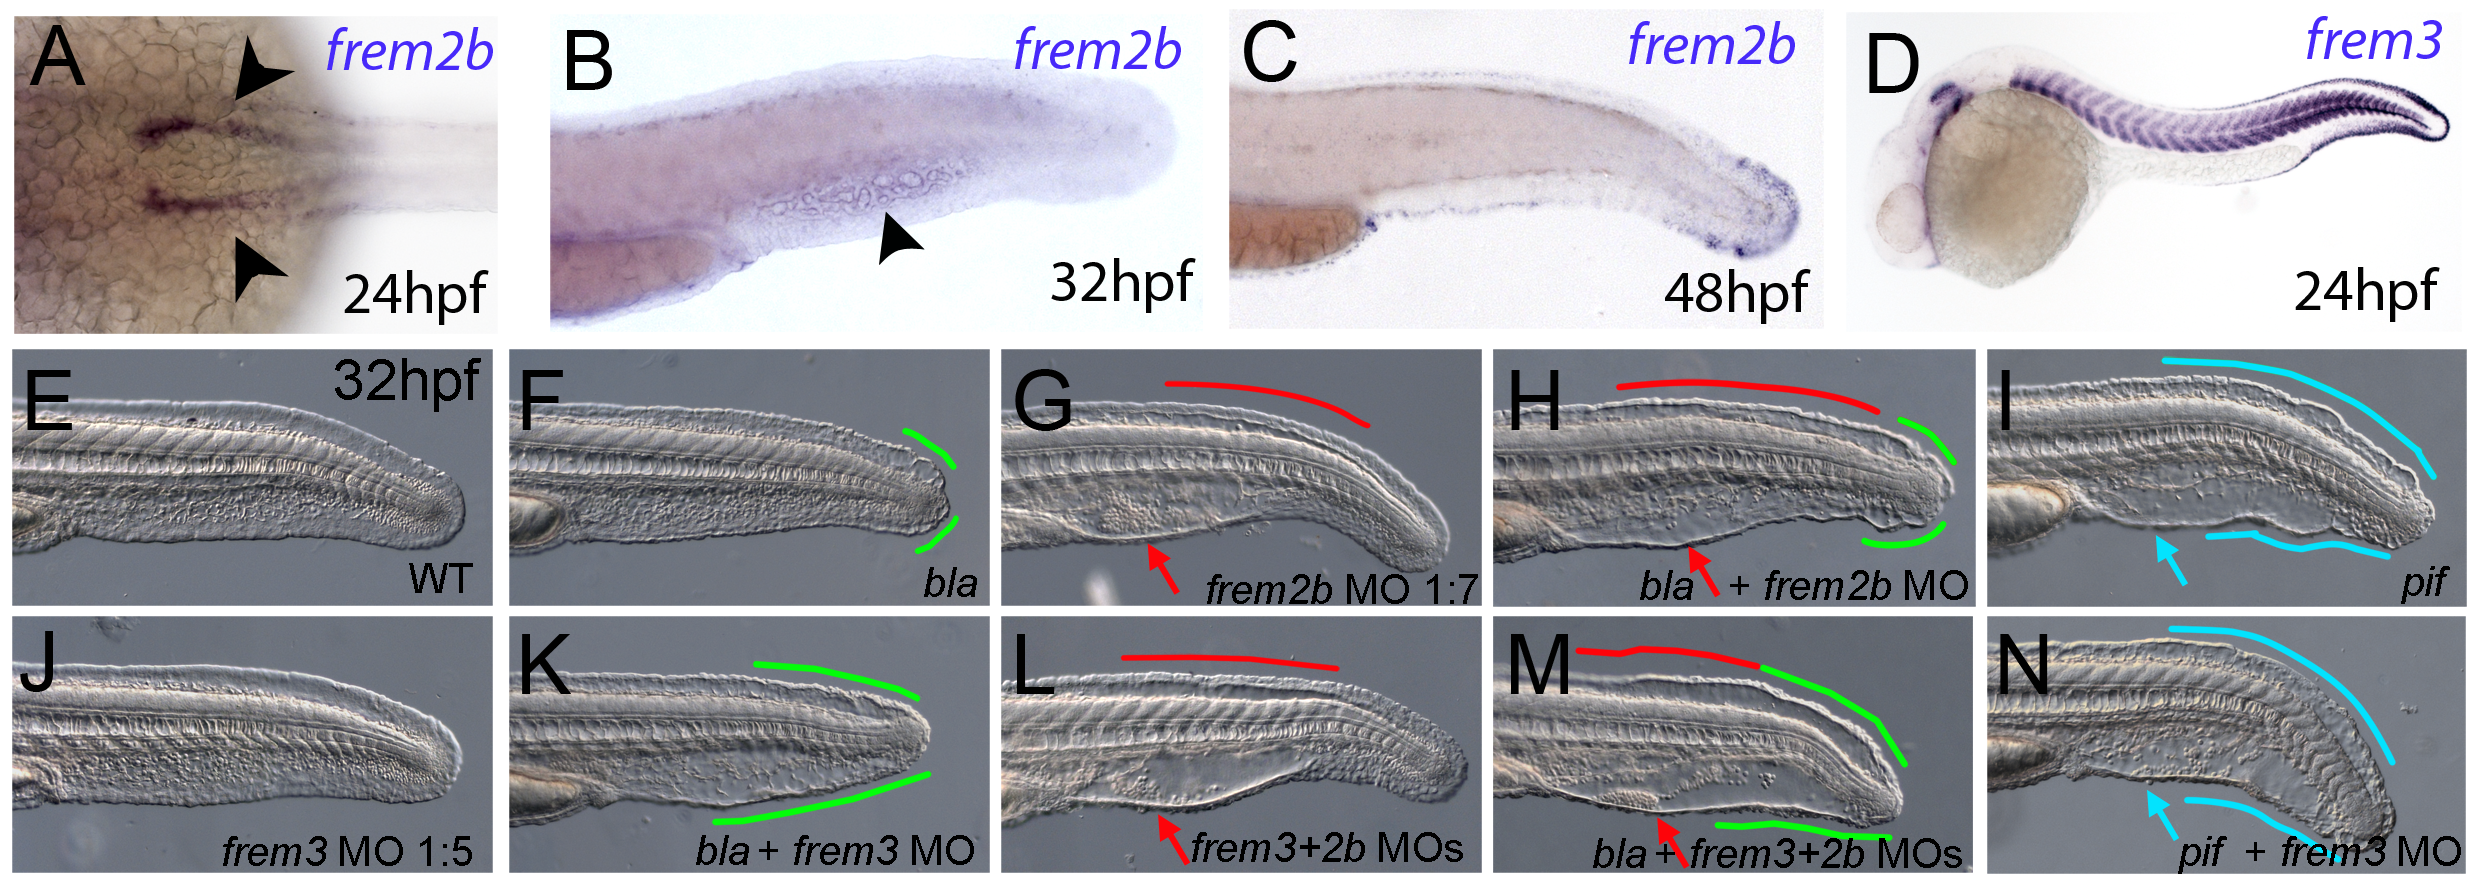 Partially redundant roles of zebrafish Frem2/3 paralogues.